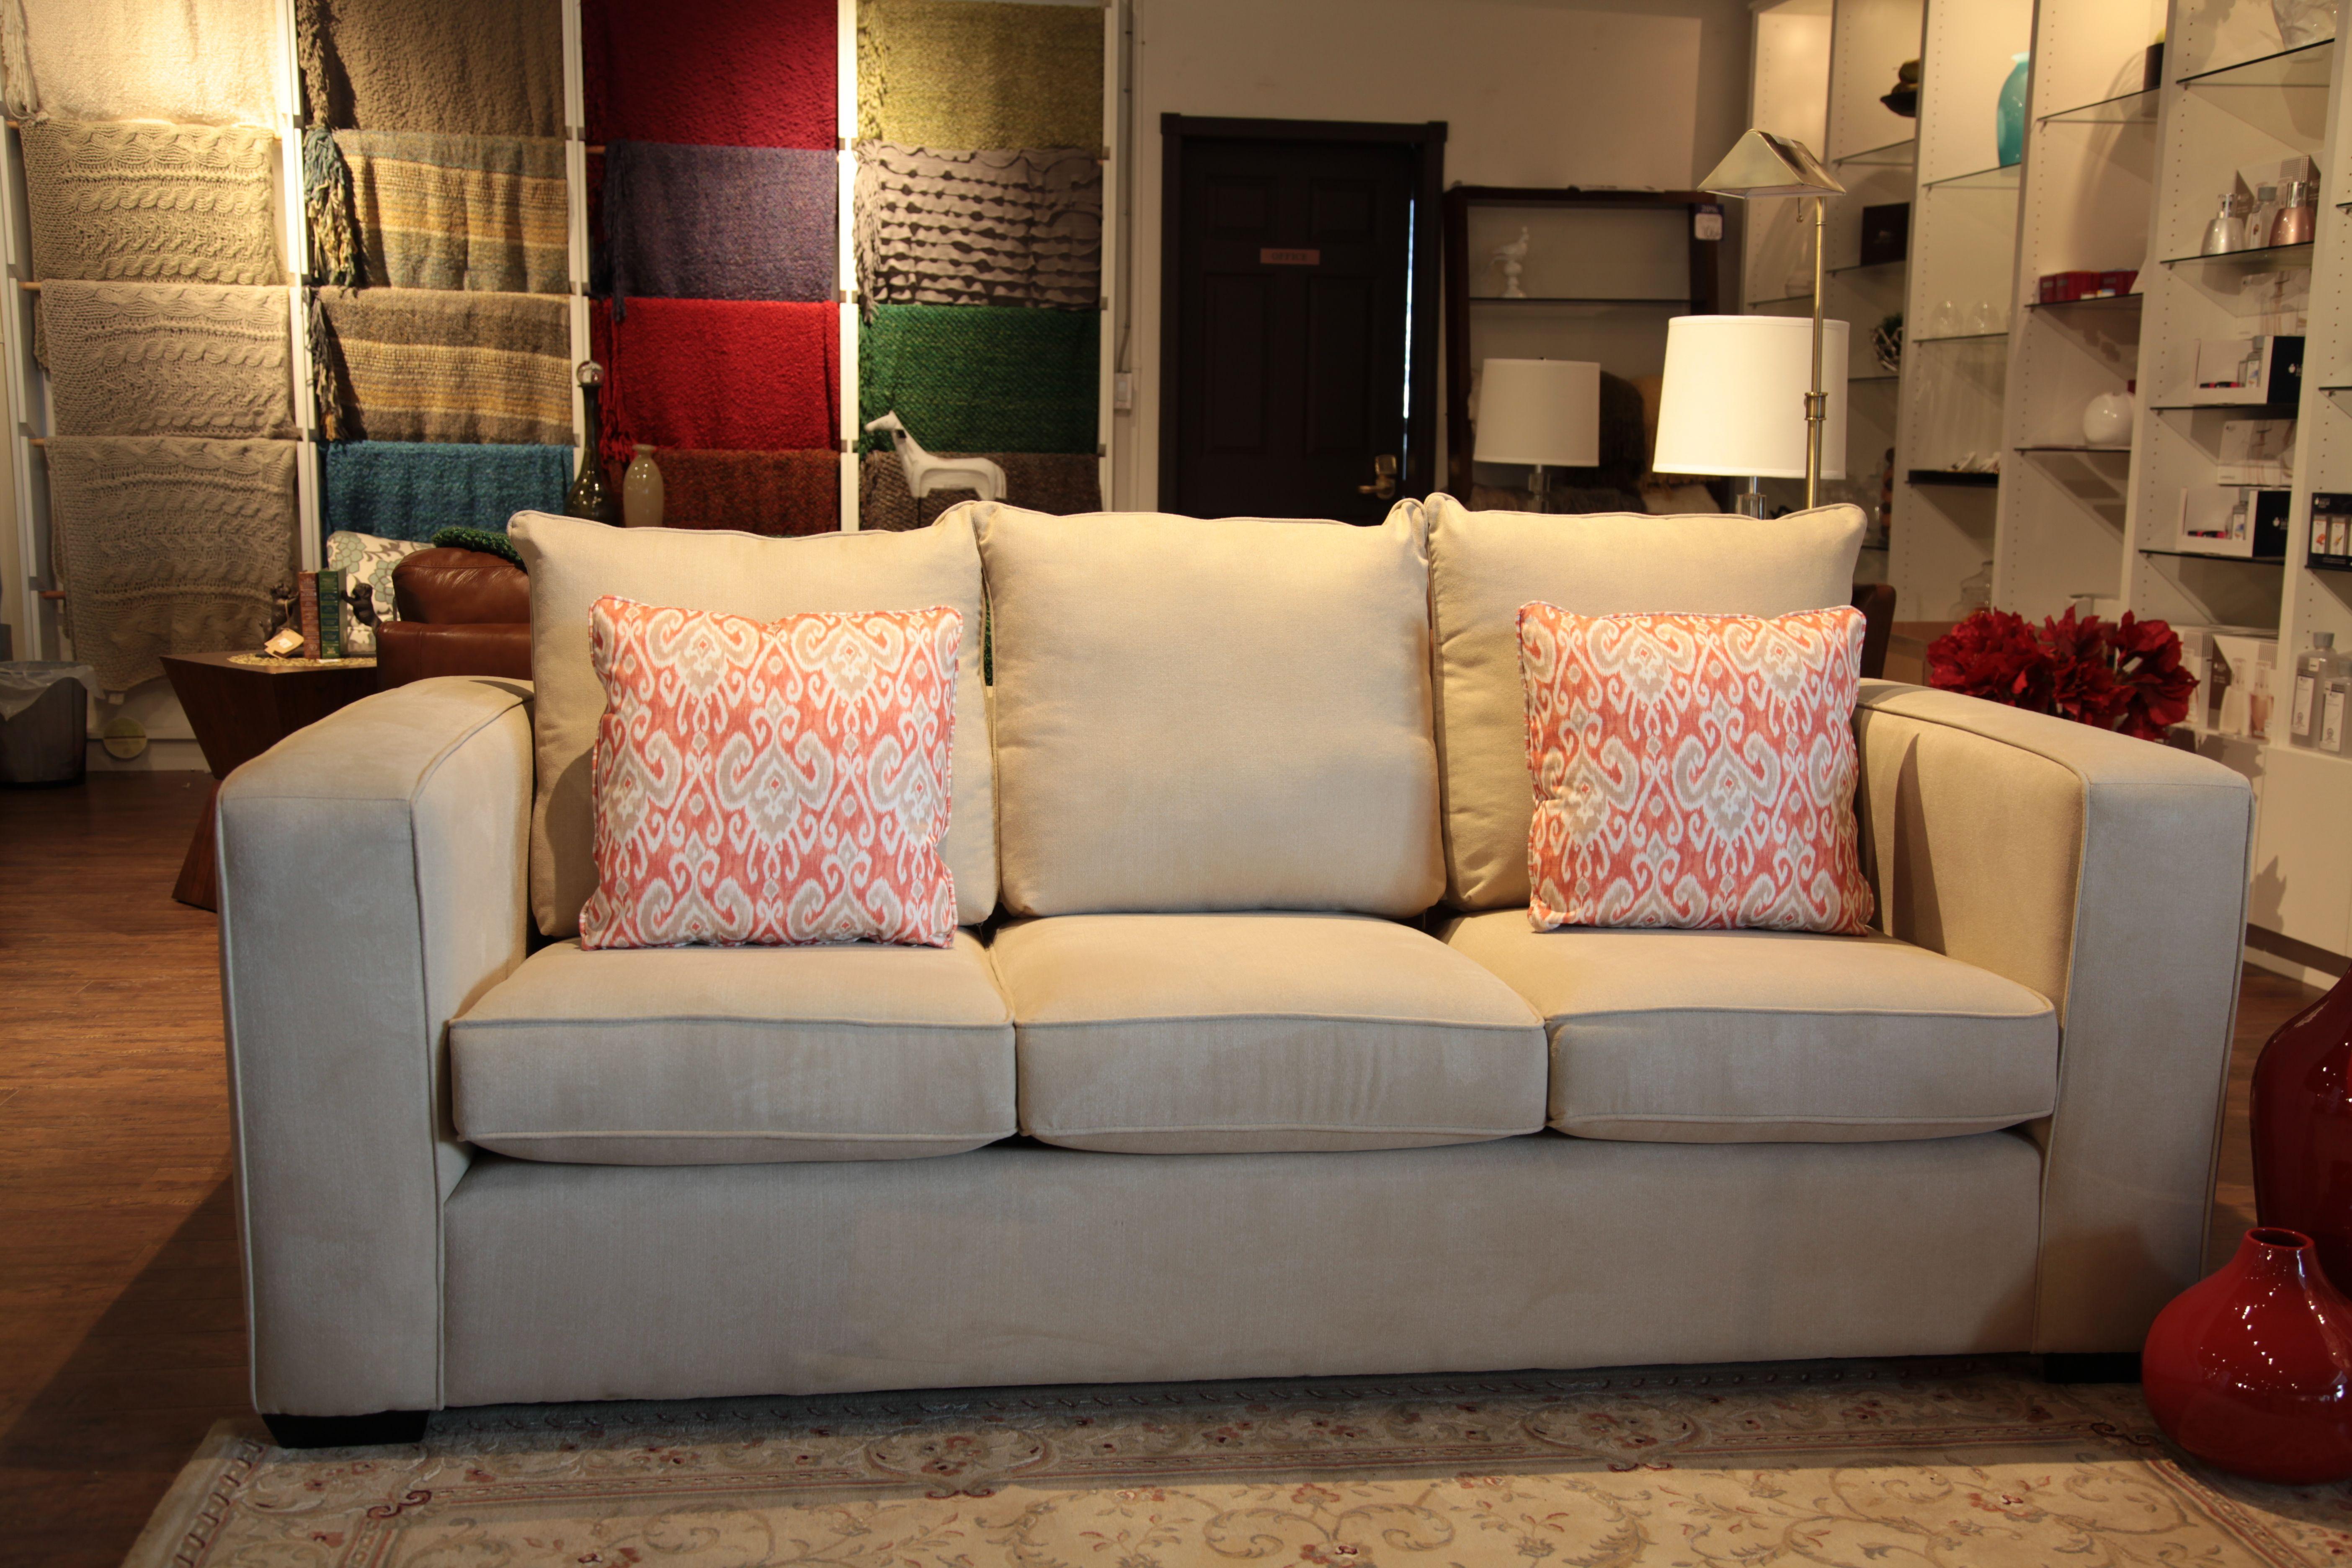 Awe Inspiring Jamie Sofa By Stylus Shown In Gr 5 Monty Ecru Available In Uwap Interior Chair Design Uwaporg